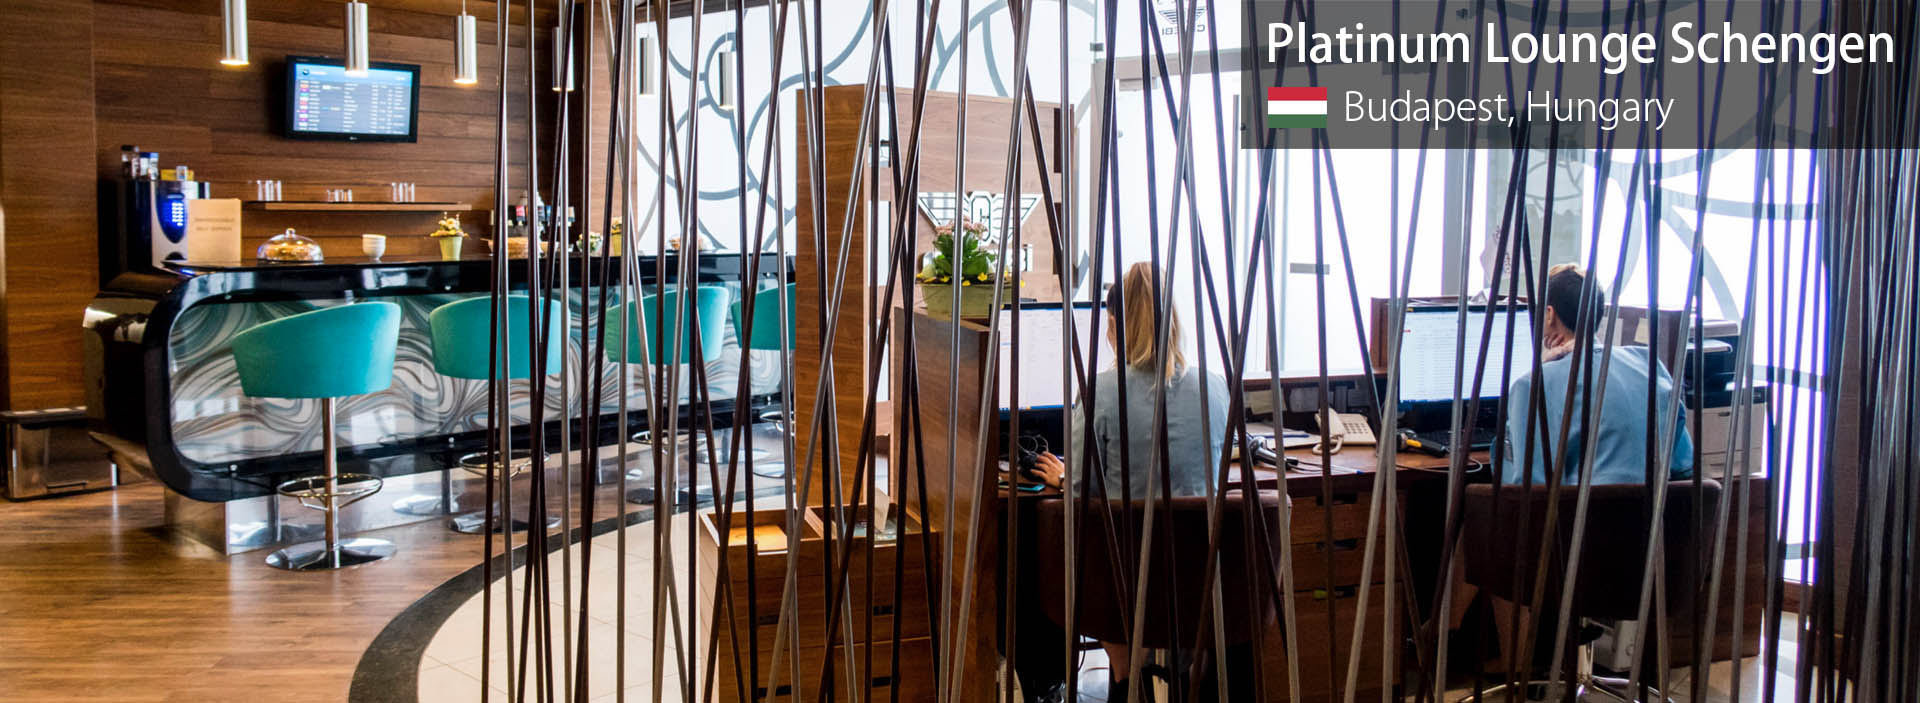 Lounge Review: Platinum Lounge Schengen at Budapest F. Liszt